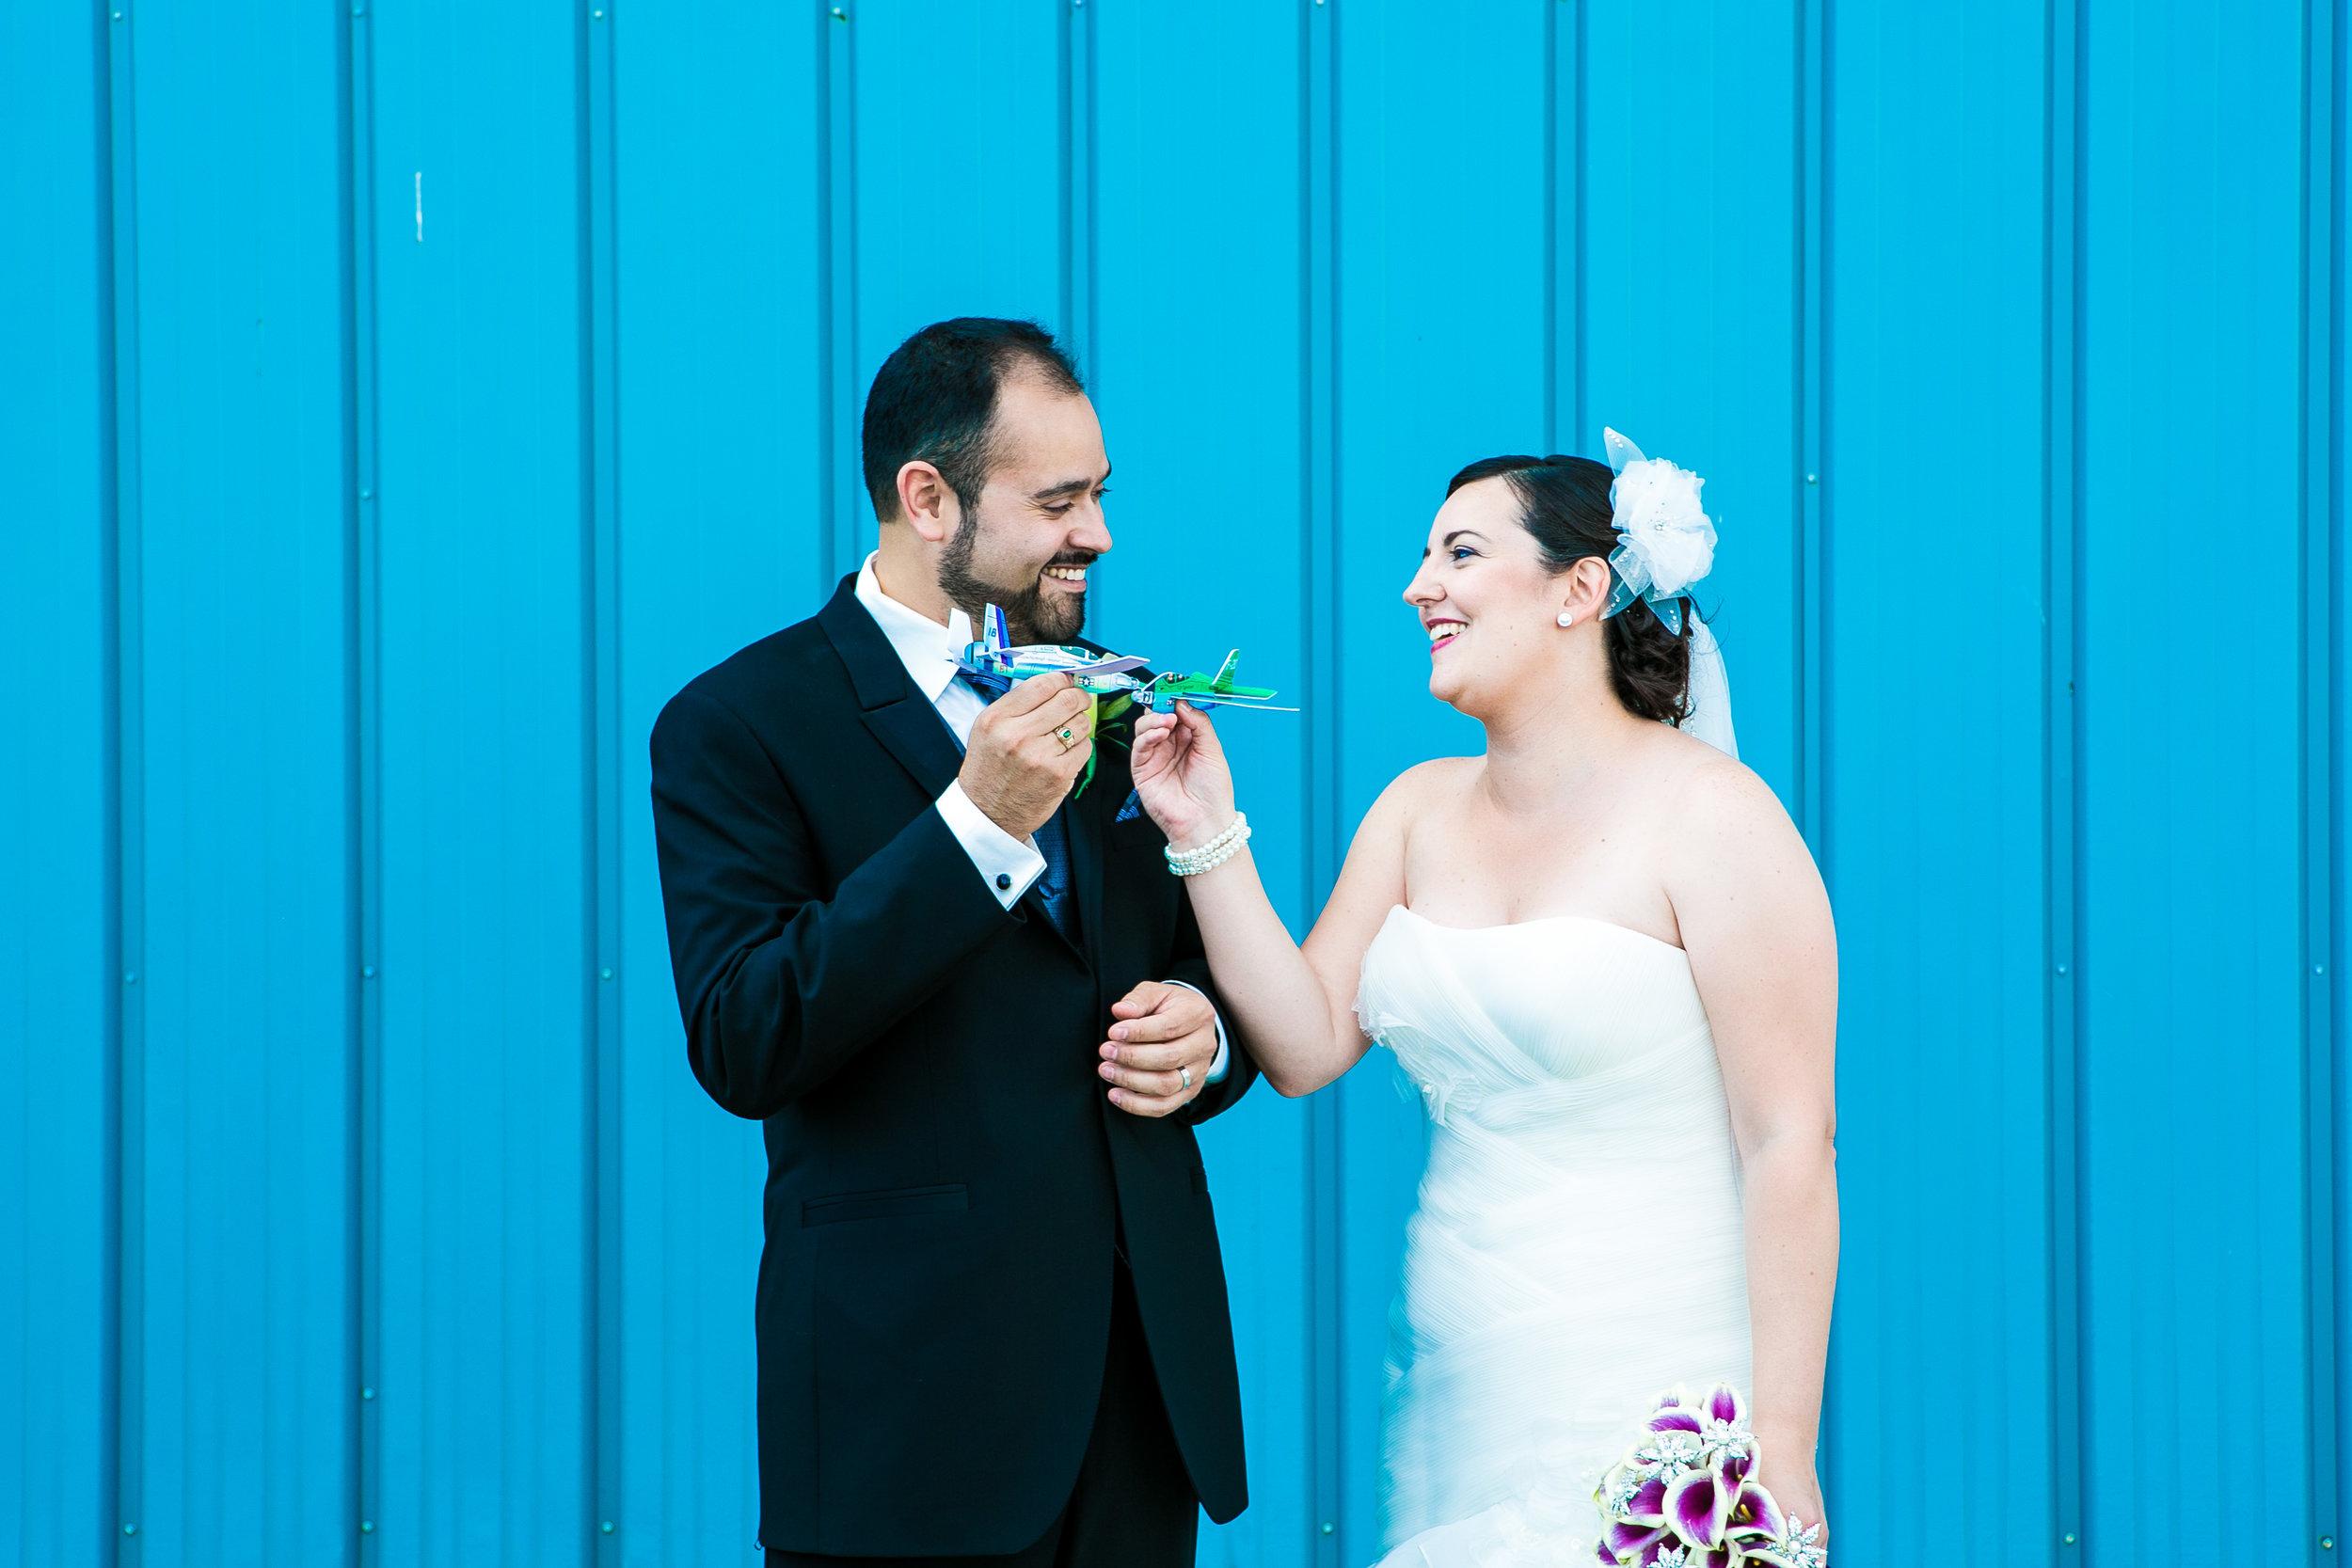 photo by: Isbertophoto Wedding Co.